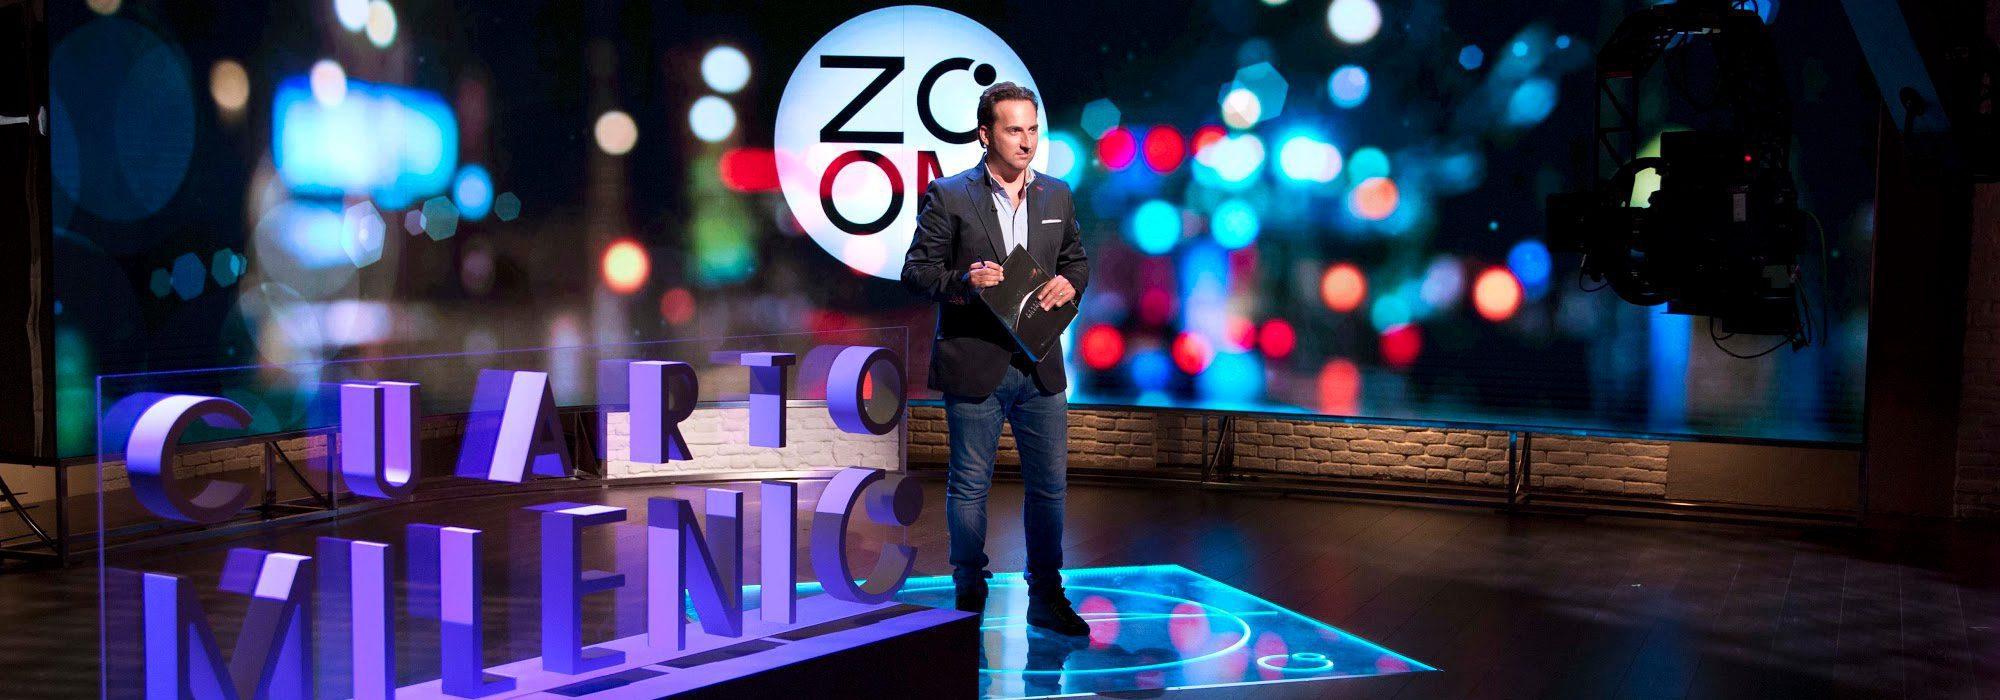 Cuarto milenio zoom cuatro ficha programas de for Cuatro tv cuarto milenio